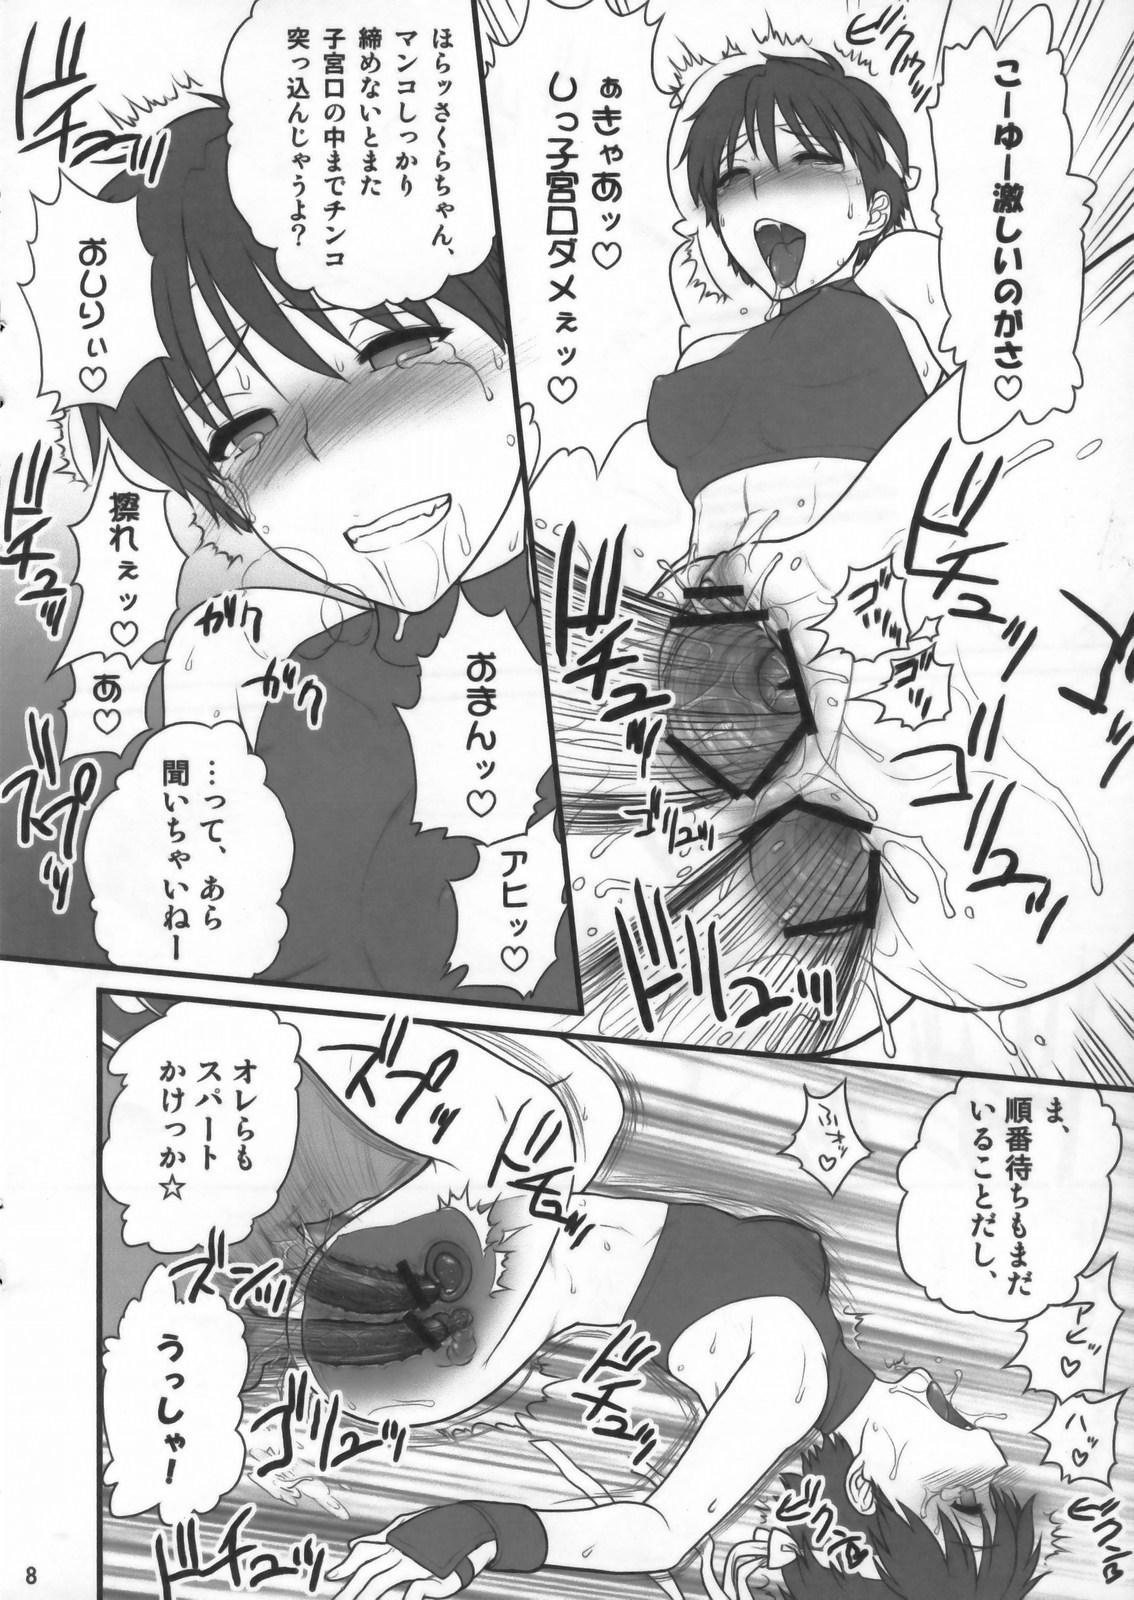 Sakura iro 7